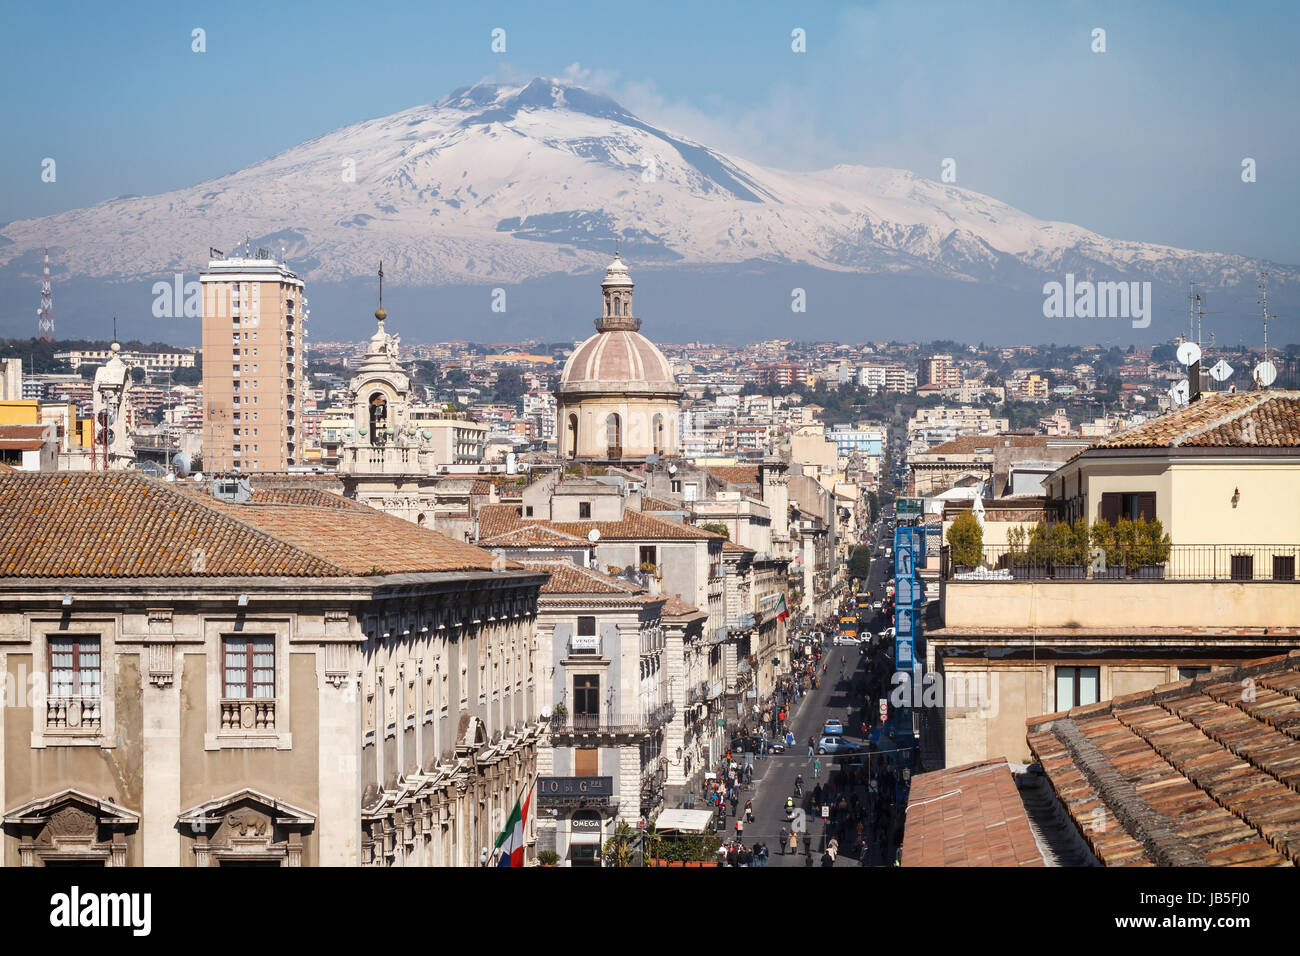 "Catania, der zentralen ""Via Etnea"" Straße mit Schnee bedeckt Vulkan Ätna, Sizilien, Italien. Stockbild"